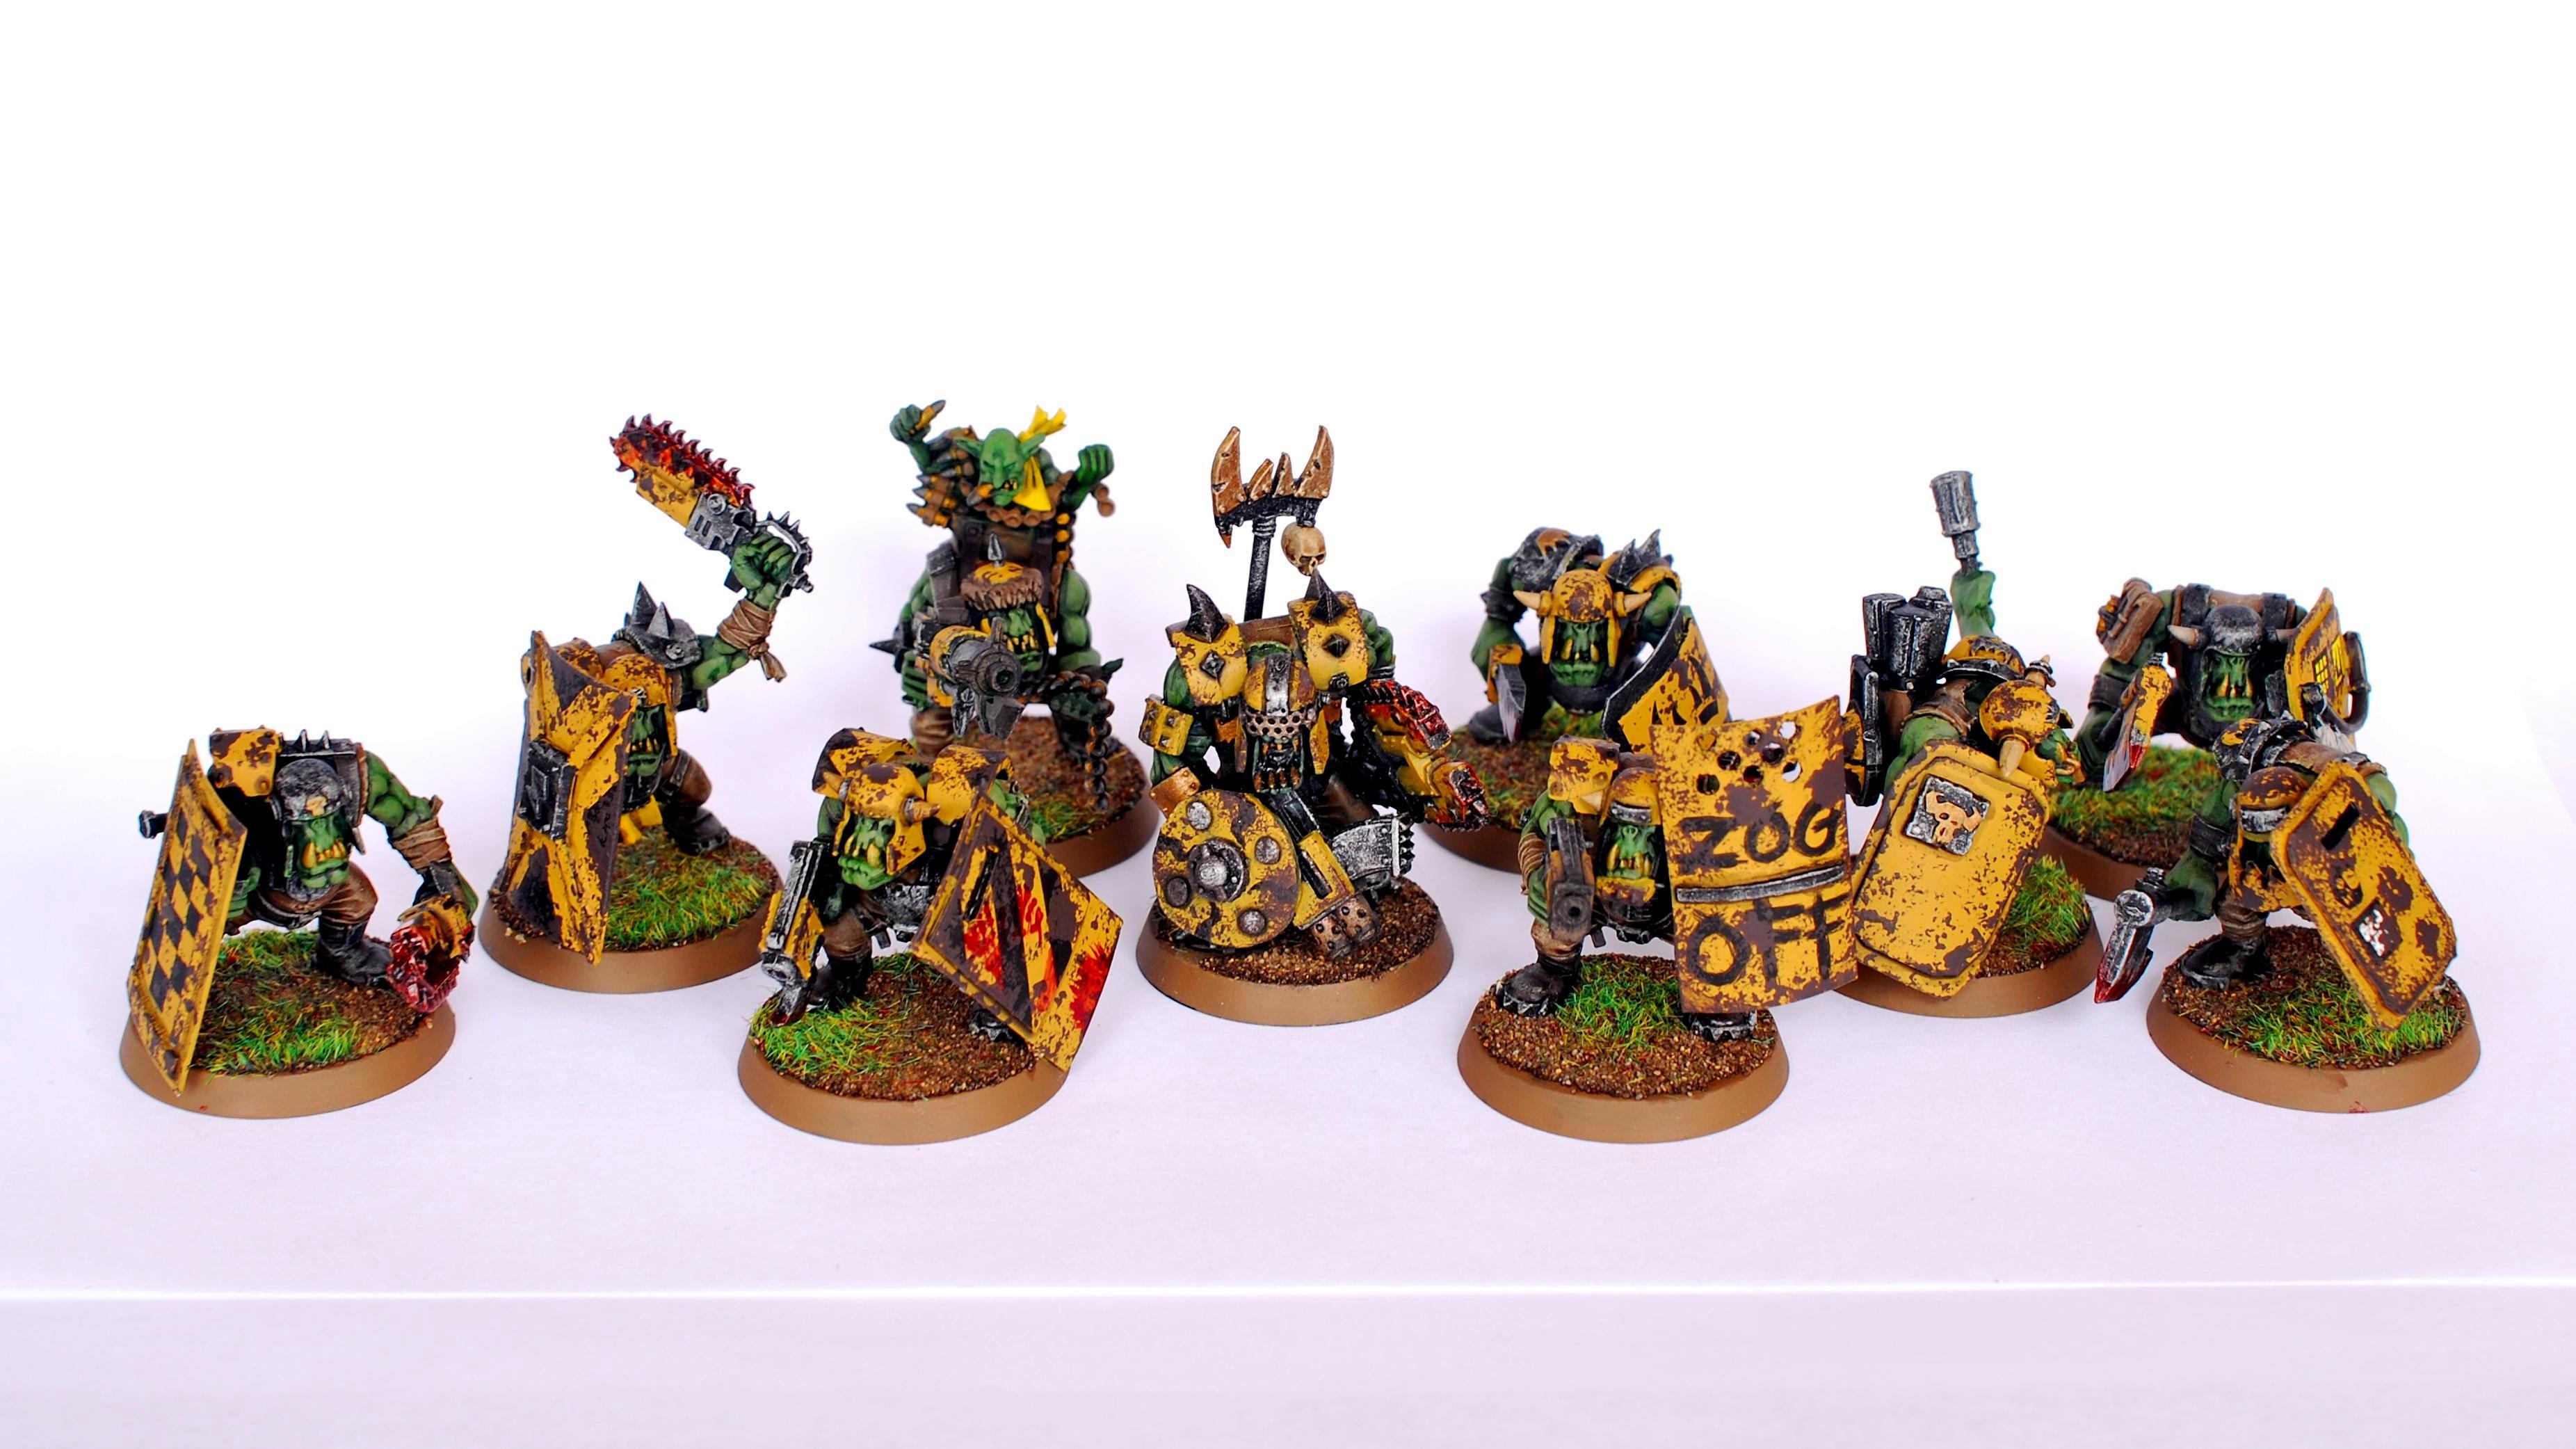 Ard Boyz, Bad Moons, Orks